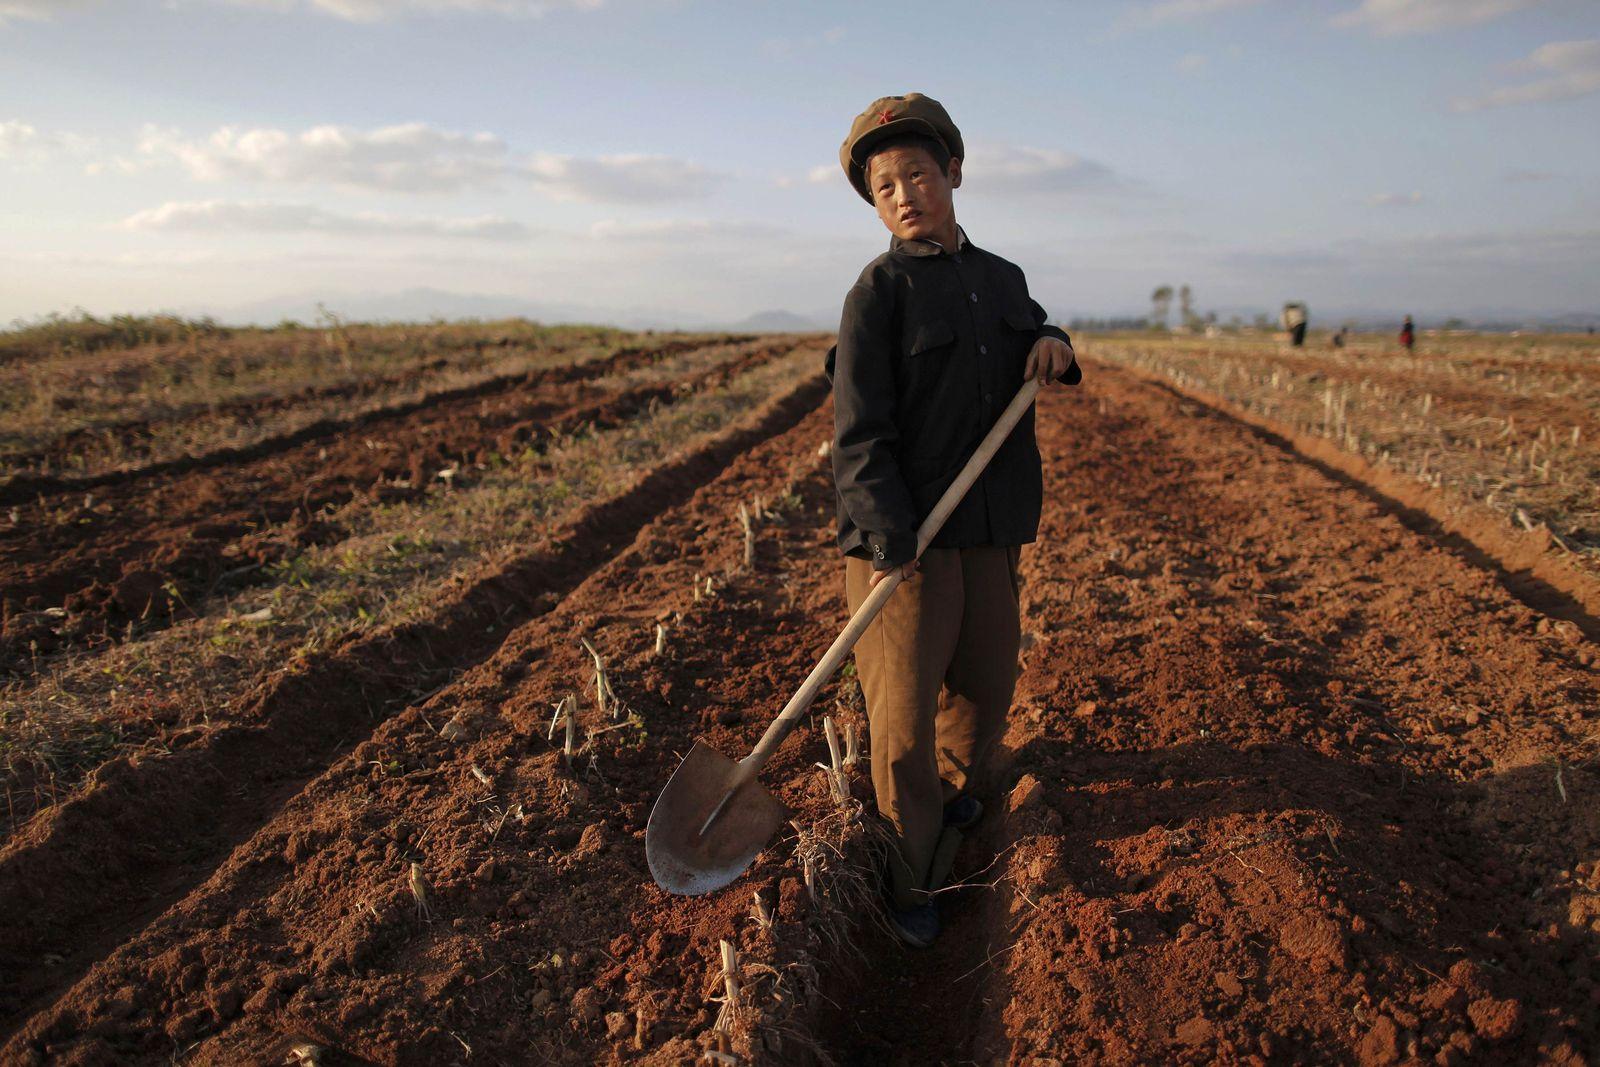 Nordkorea / Landwirtschaft